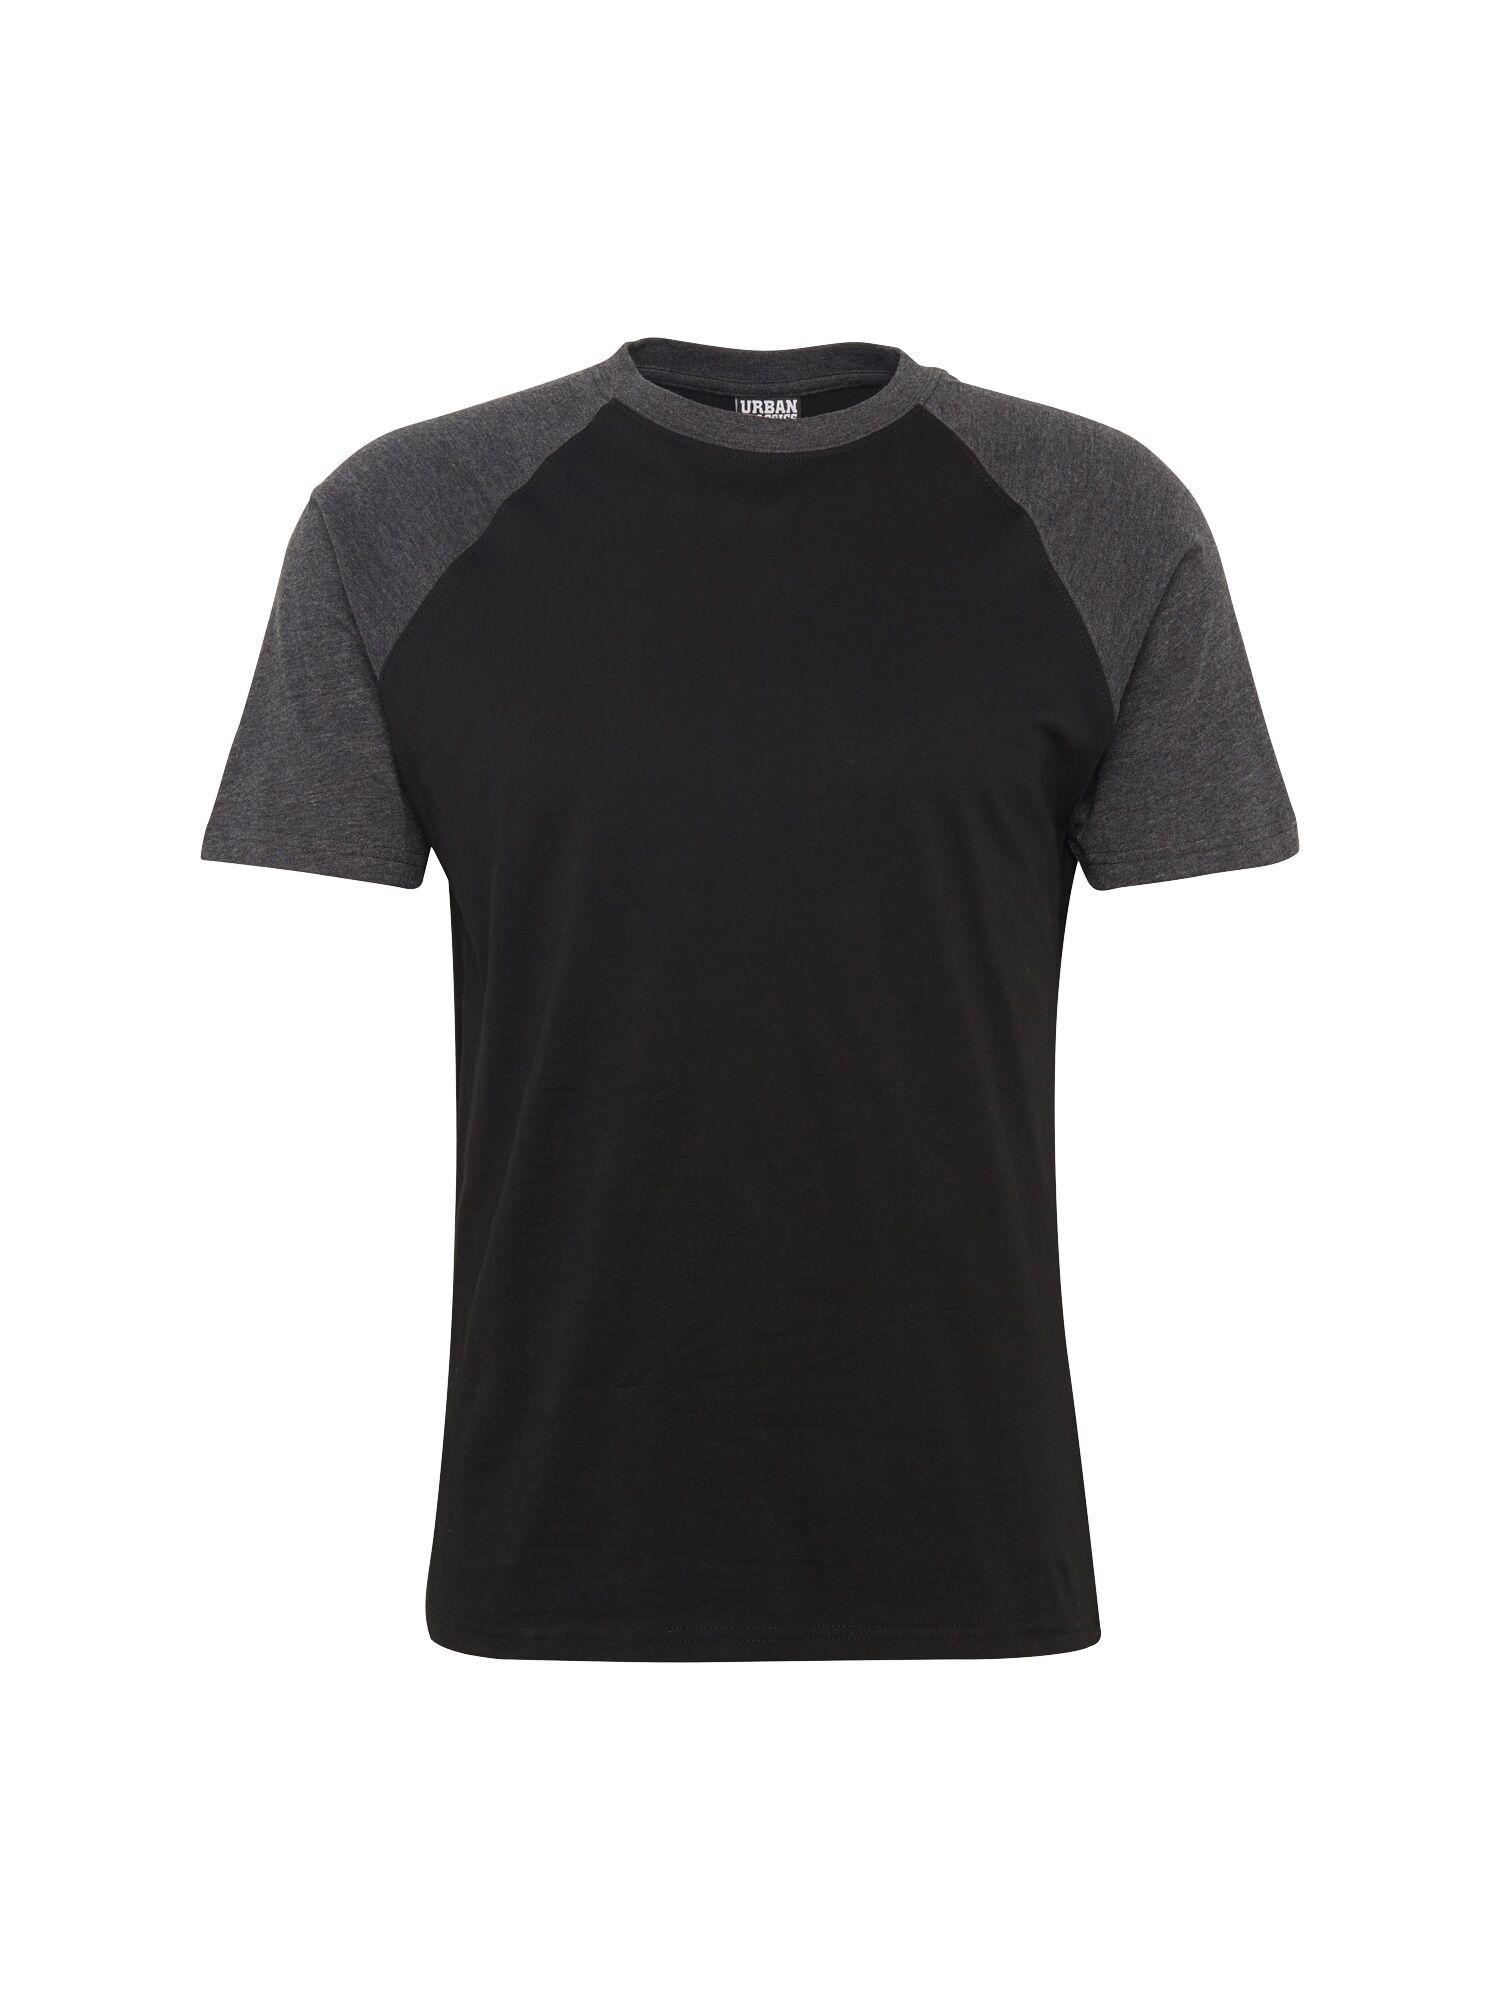 Urban Classics T-Shirt  - Noir - Taille: M - male